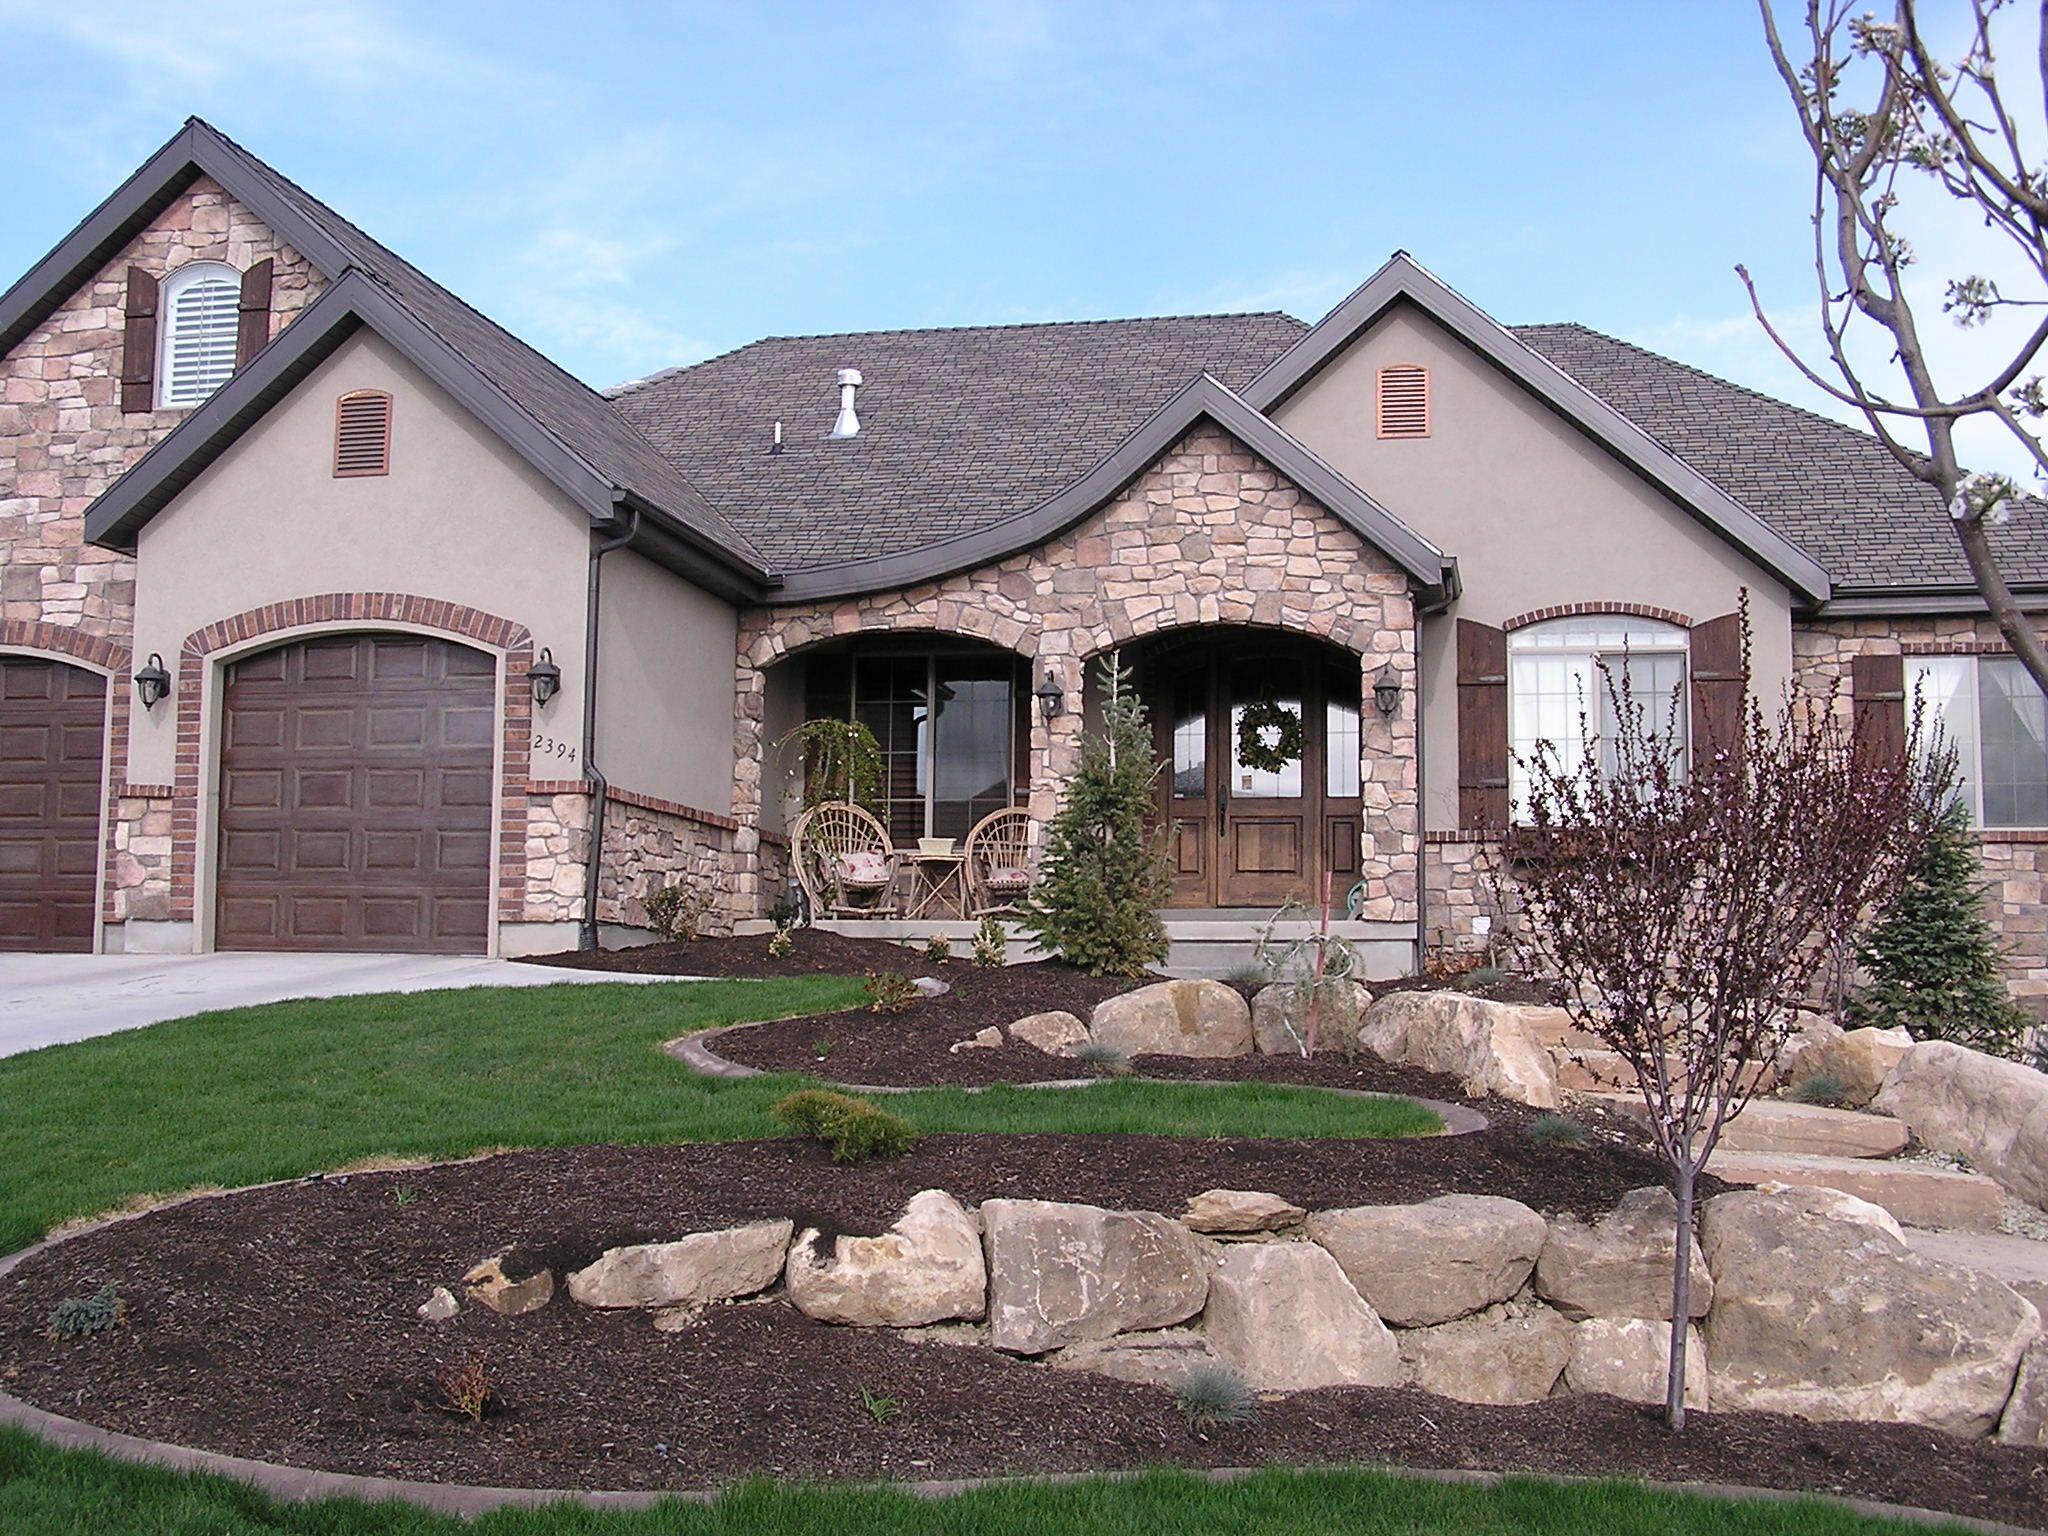 18 Amazing Brick And Stucco House House Plans 74436